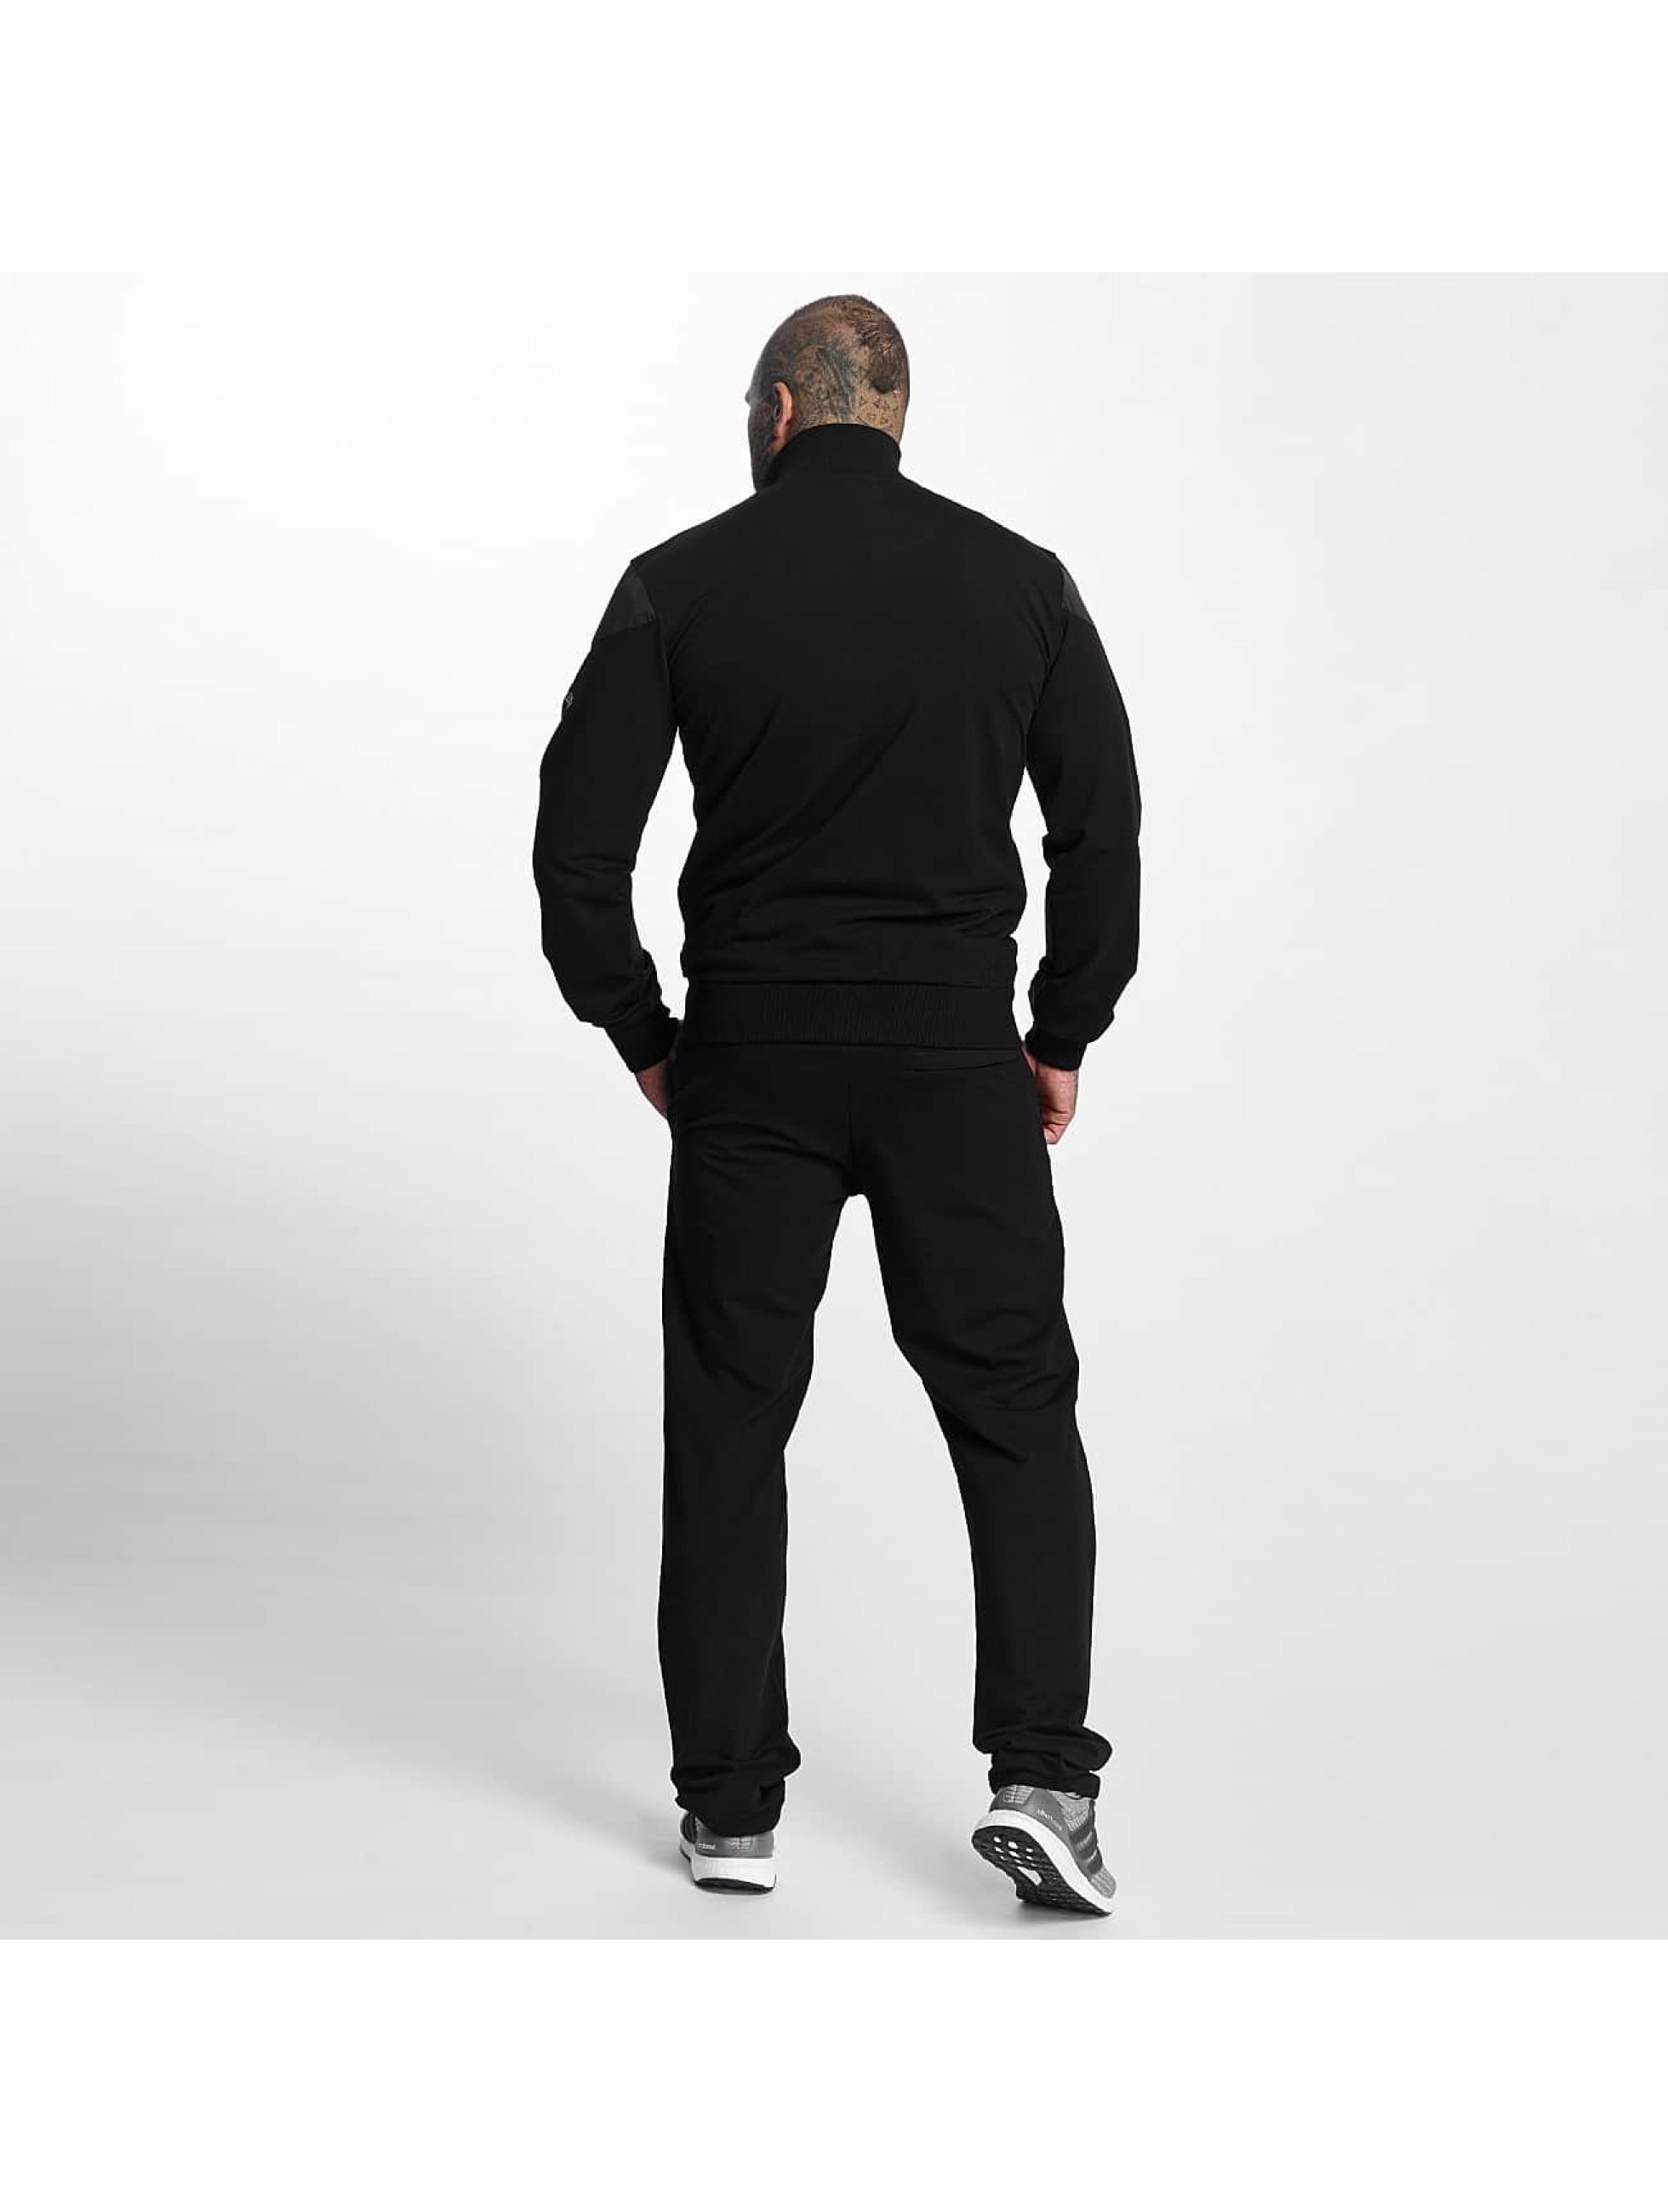 Pro Violence Streetwear Dresy Cosy czarny